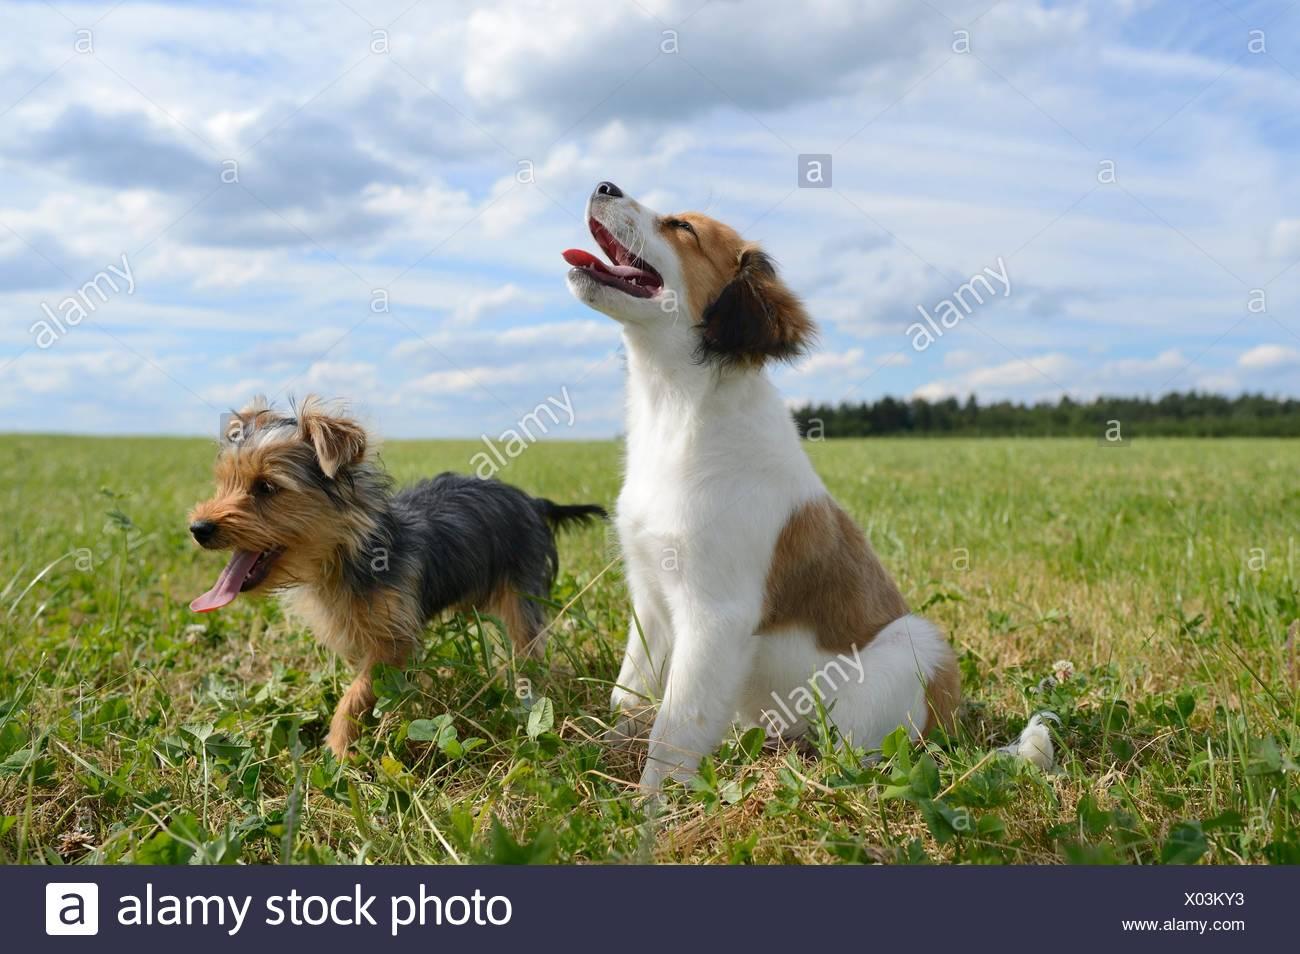 Yorkshire Terrier and Niederlande Kooikerhondje, Upper Palatinate, Germany, Europe - Stock Image